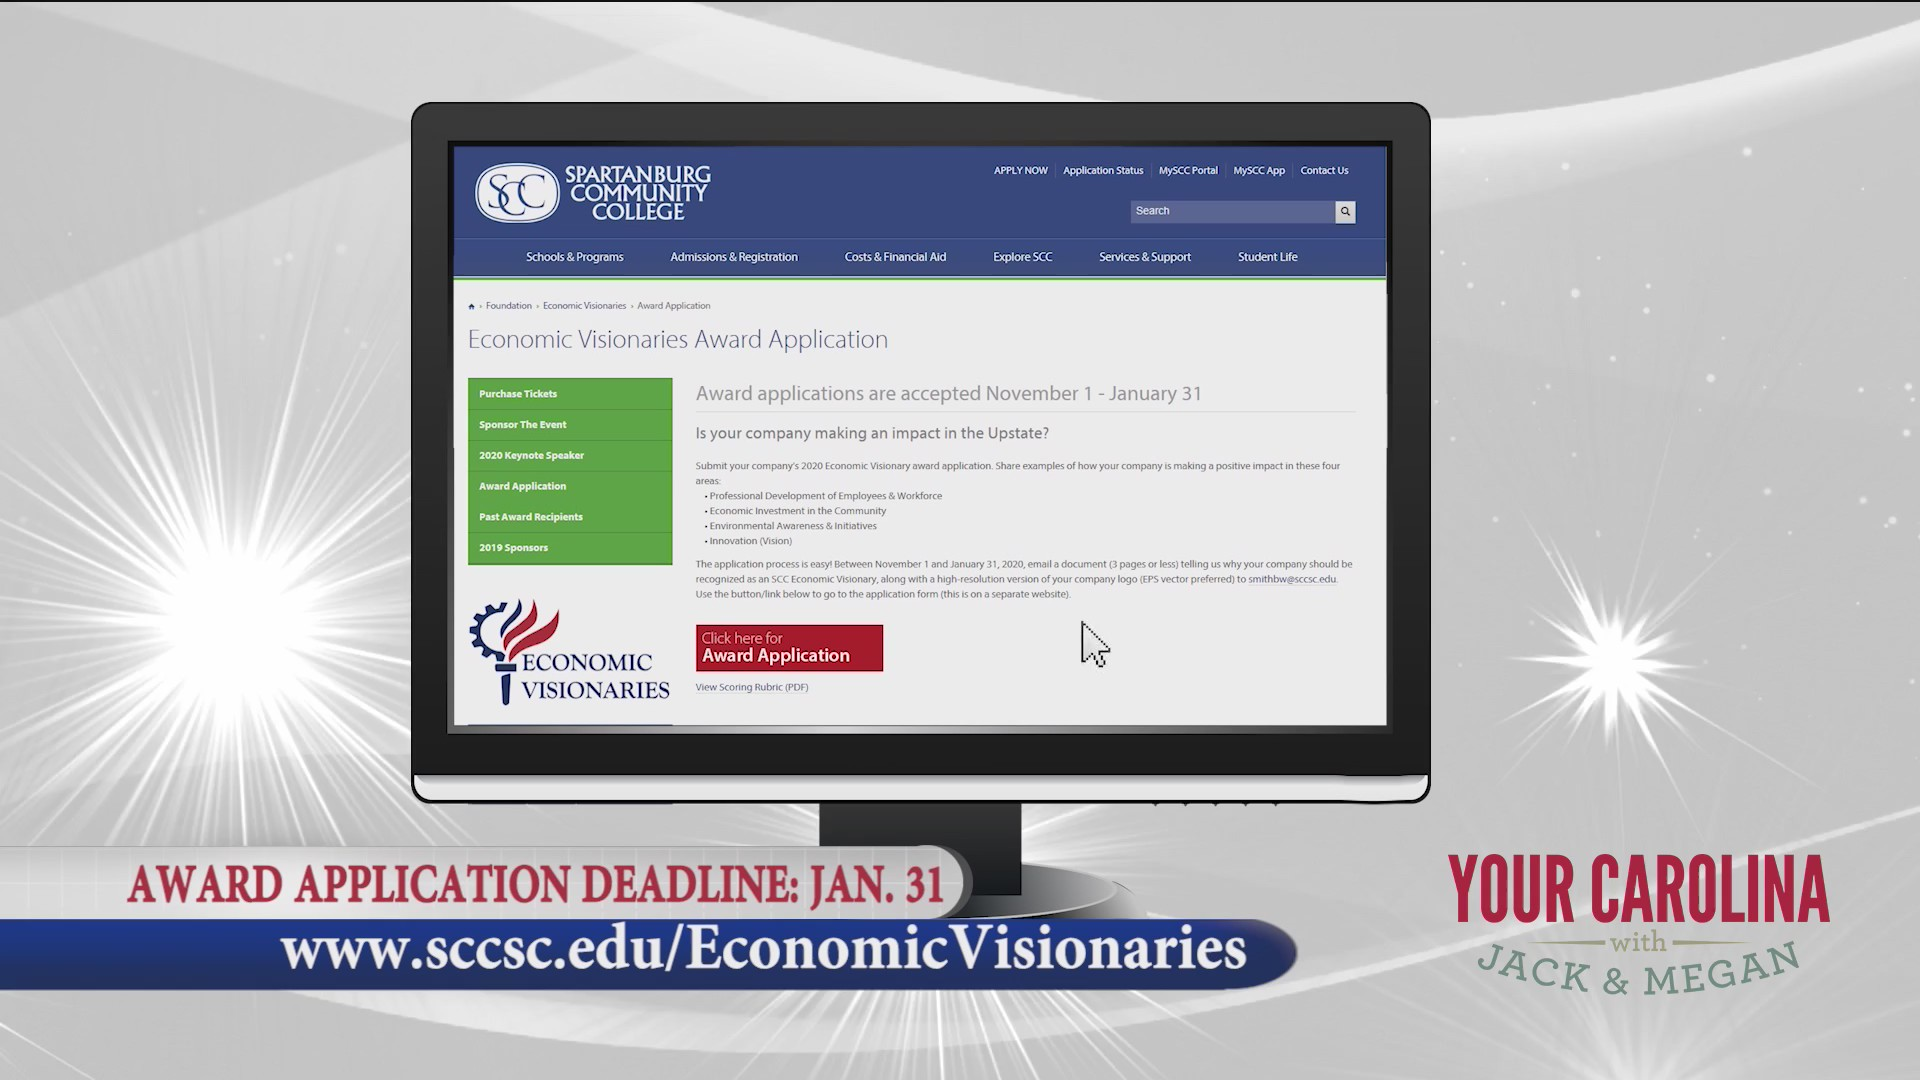 SCC's Economic Visionaries Event Award Application Deadline